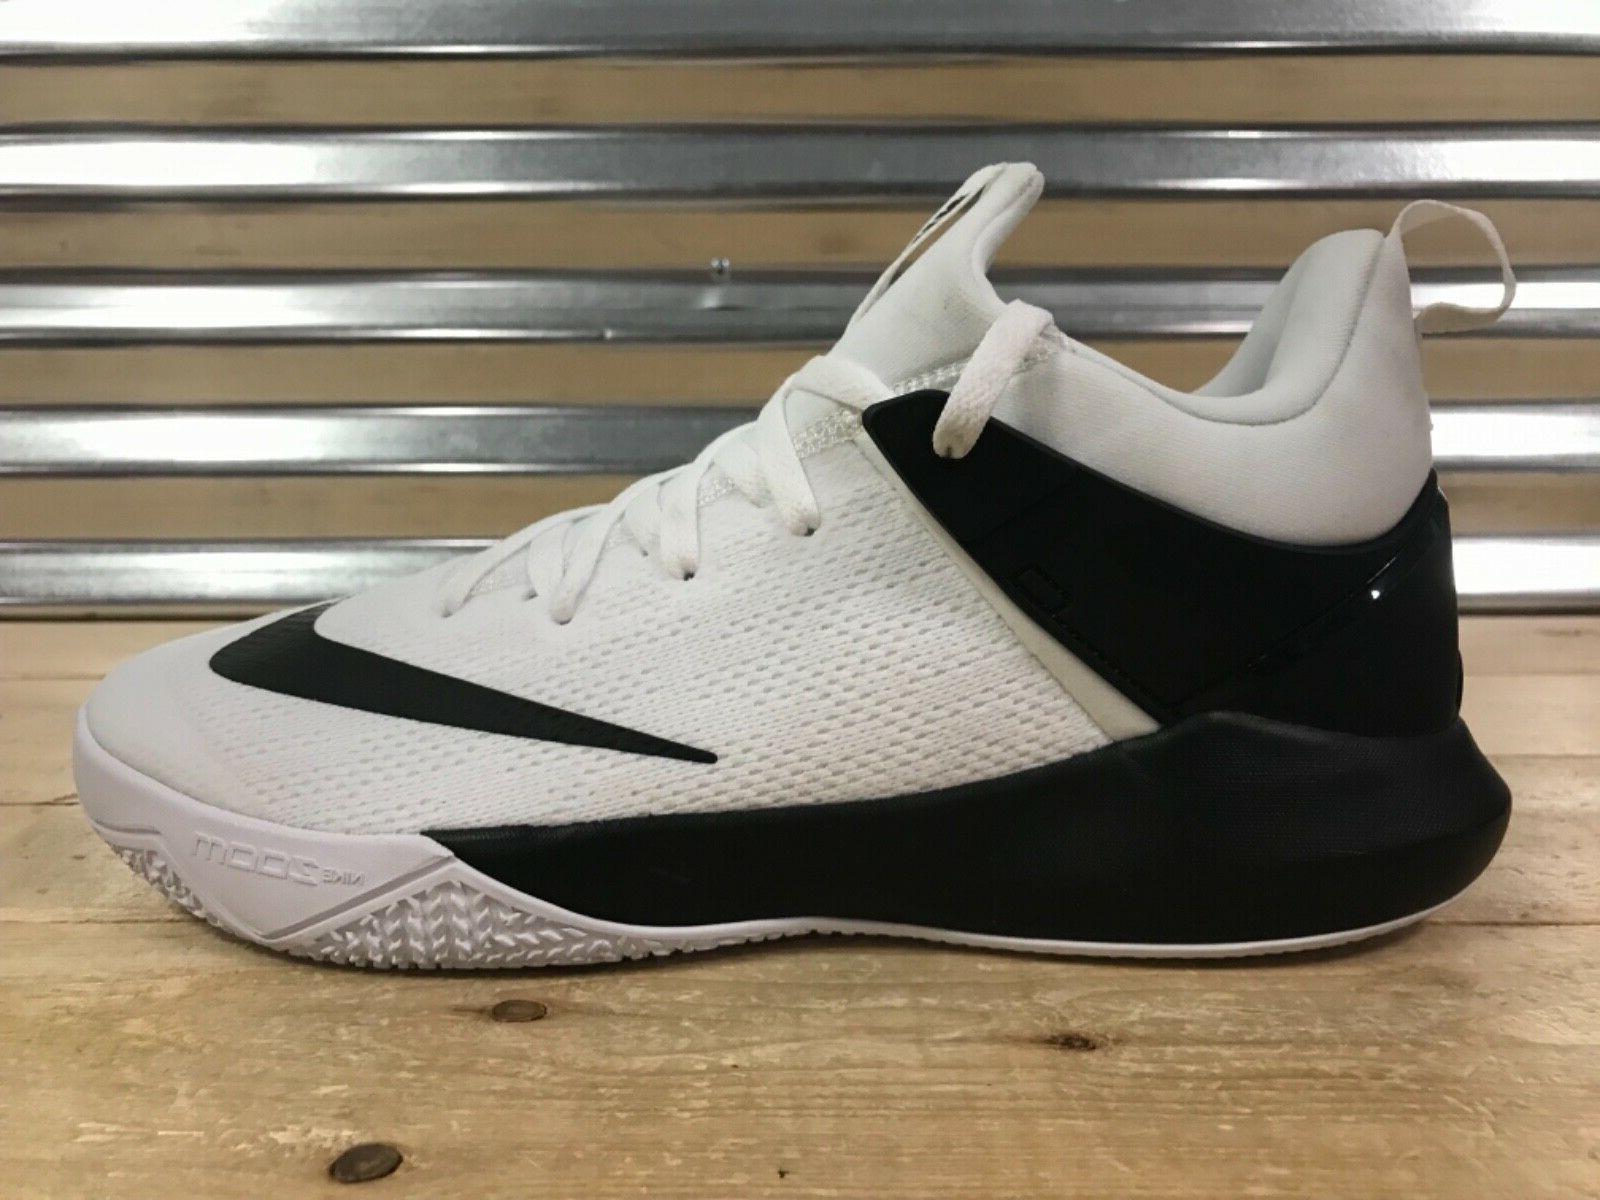 Nike Shift TB Basketball Shoes Oreo SZ 13